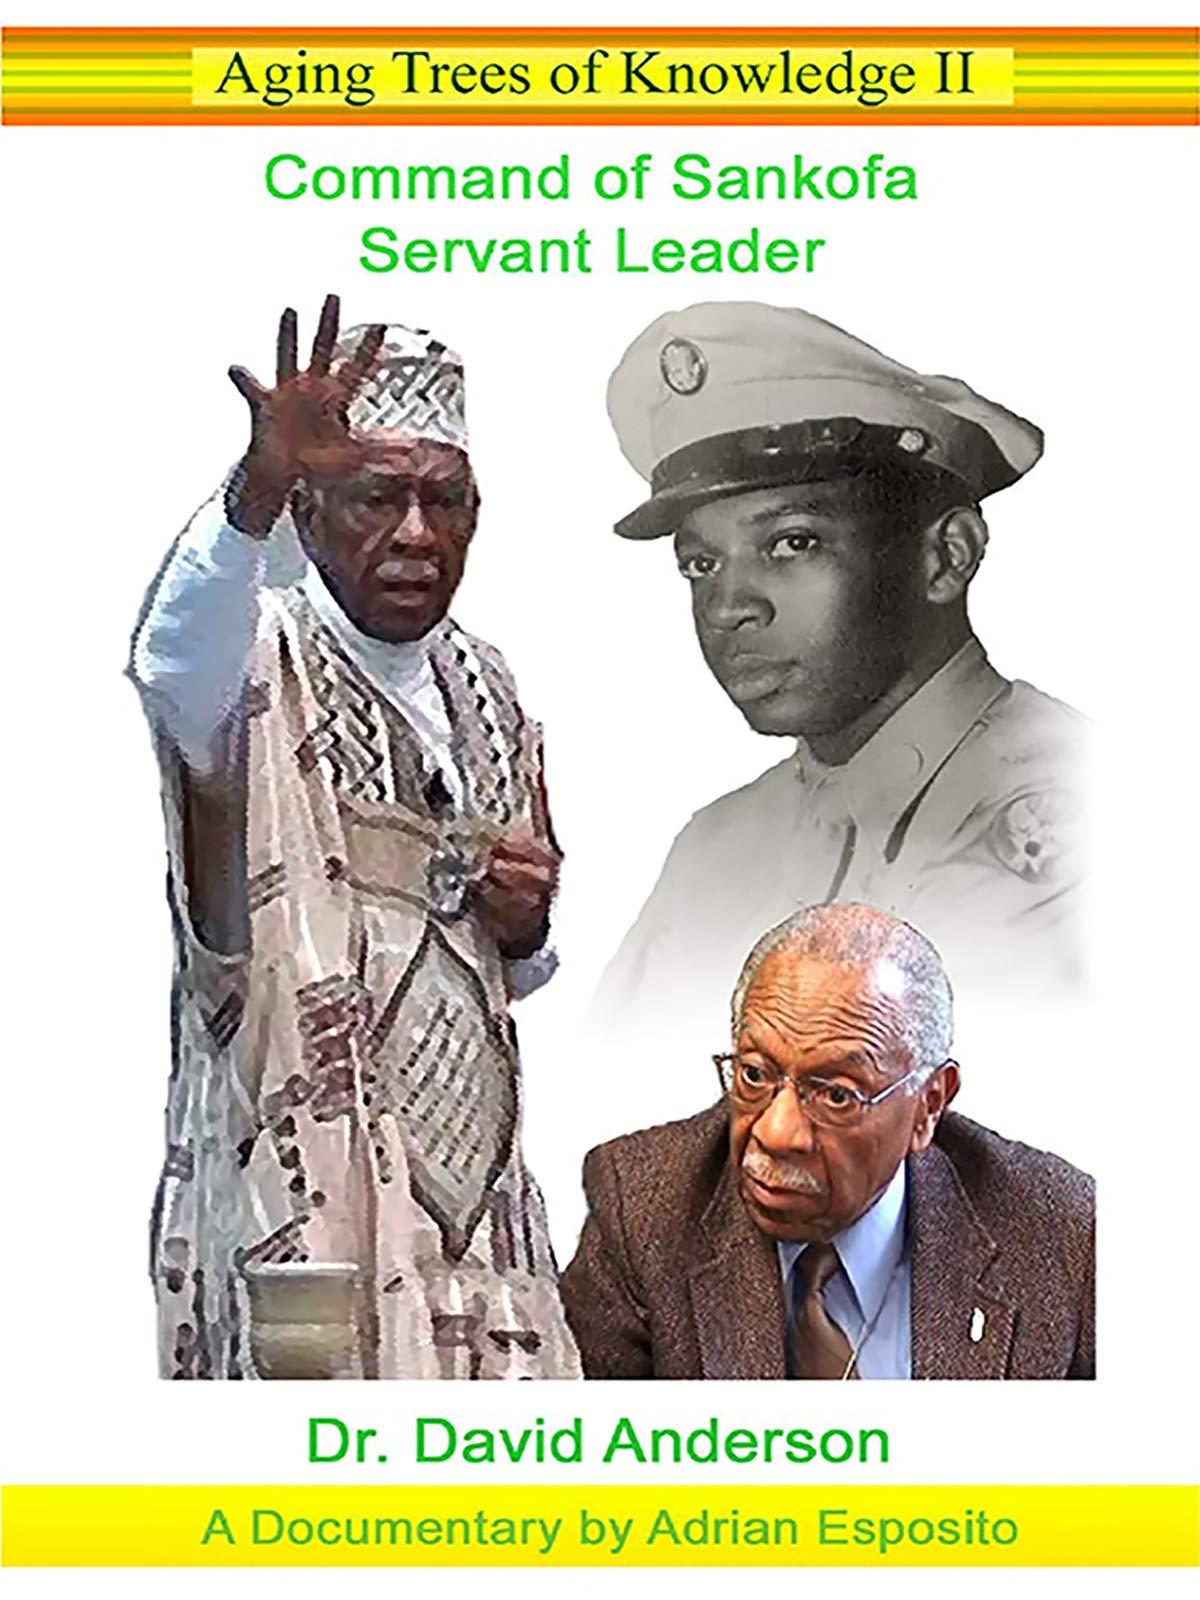 Aging Trees of Knowledge 2: Command of Sankofa, Servant Leader